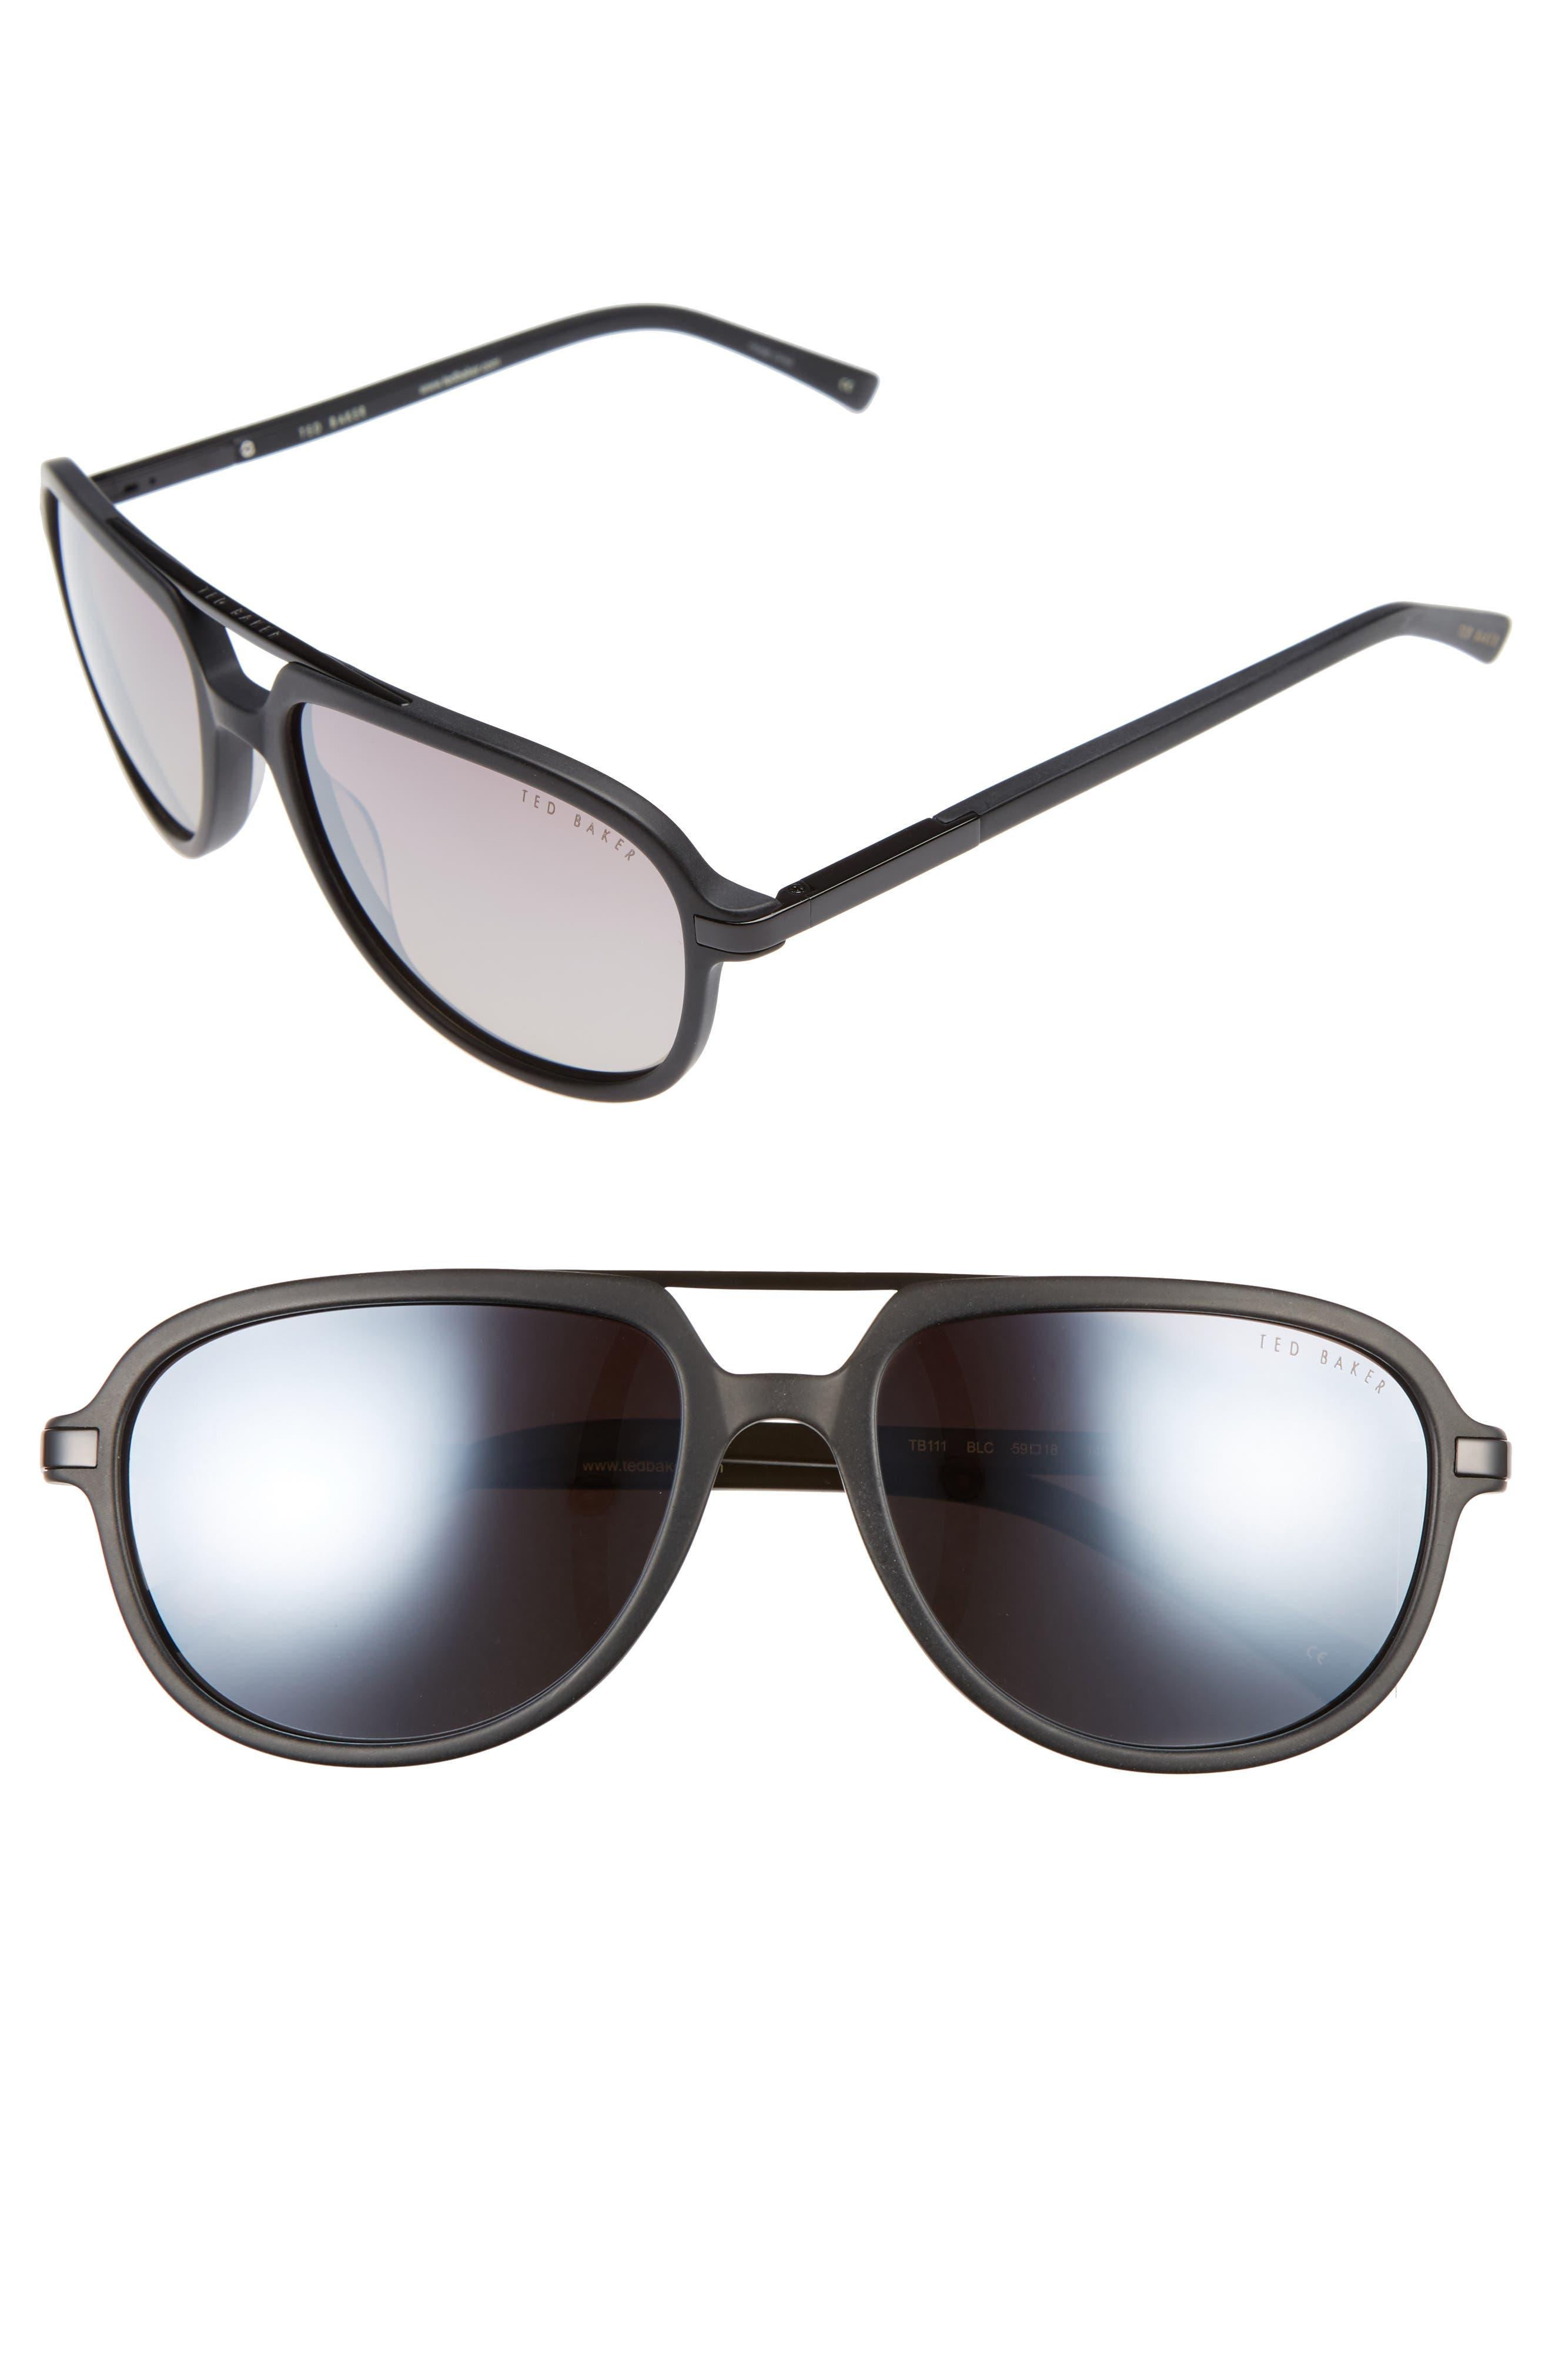 59mm Polarized Aviator Sunglasses,                             Main thumbnail 1, color,                             001